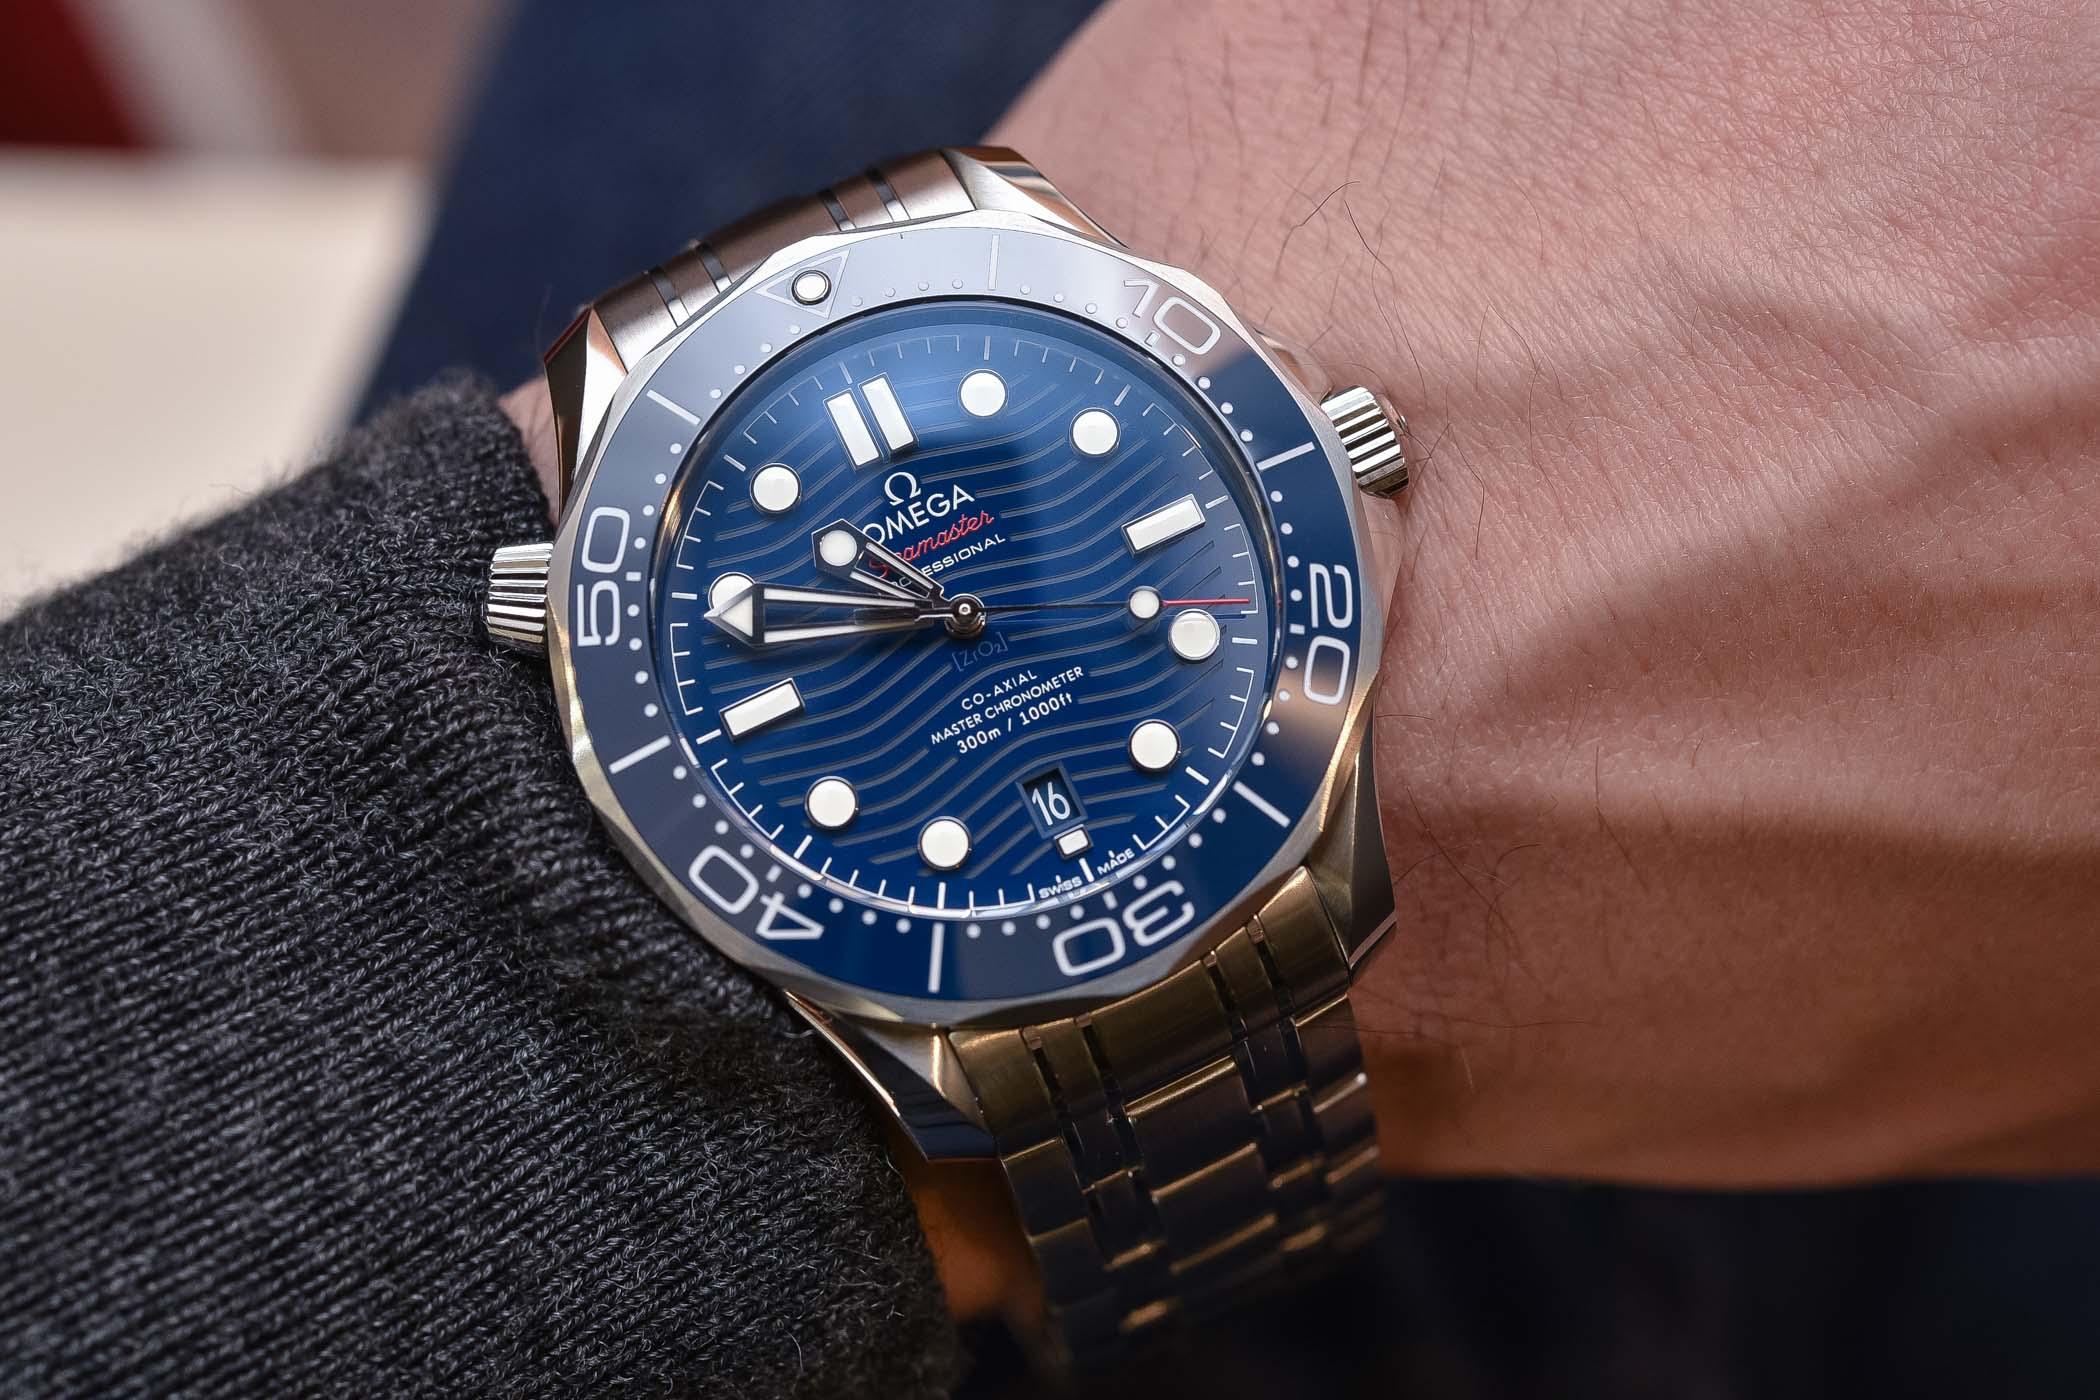 Hands On Omega Seamaster Diver 300m Master Chronometer Baselworld